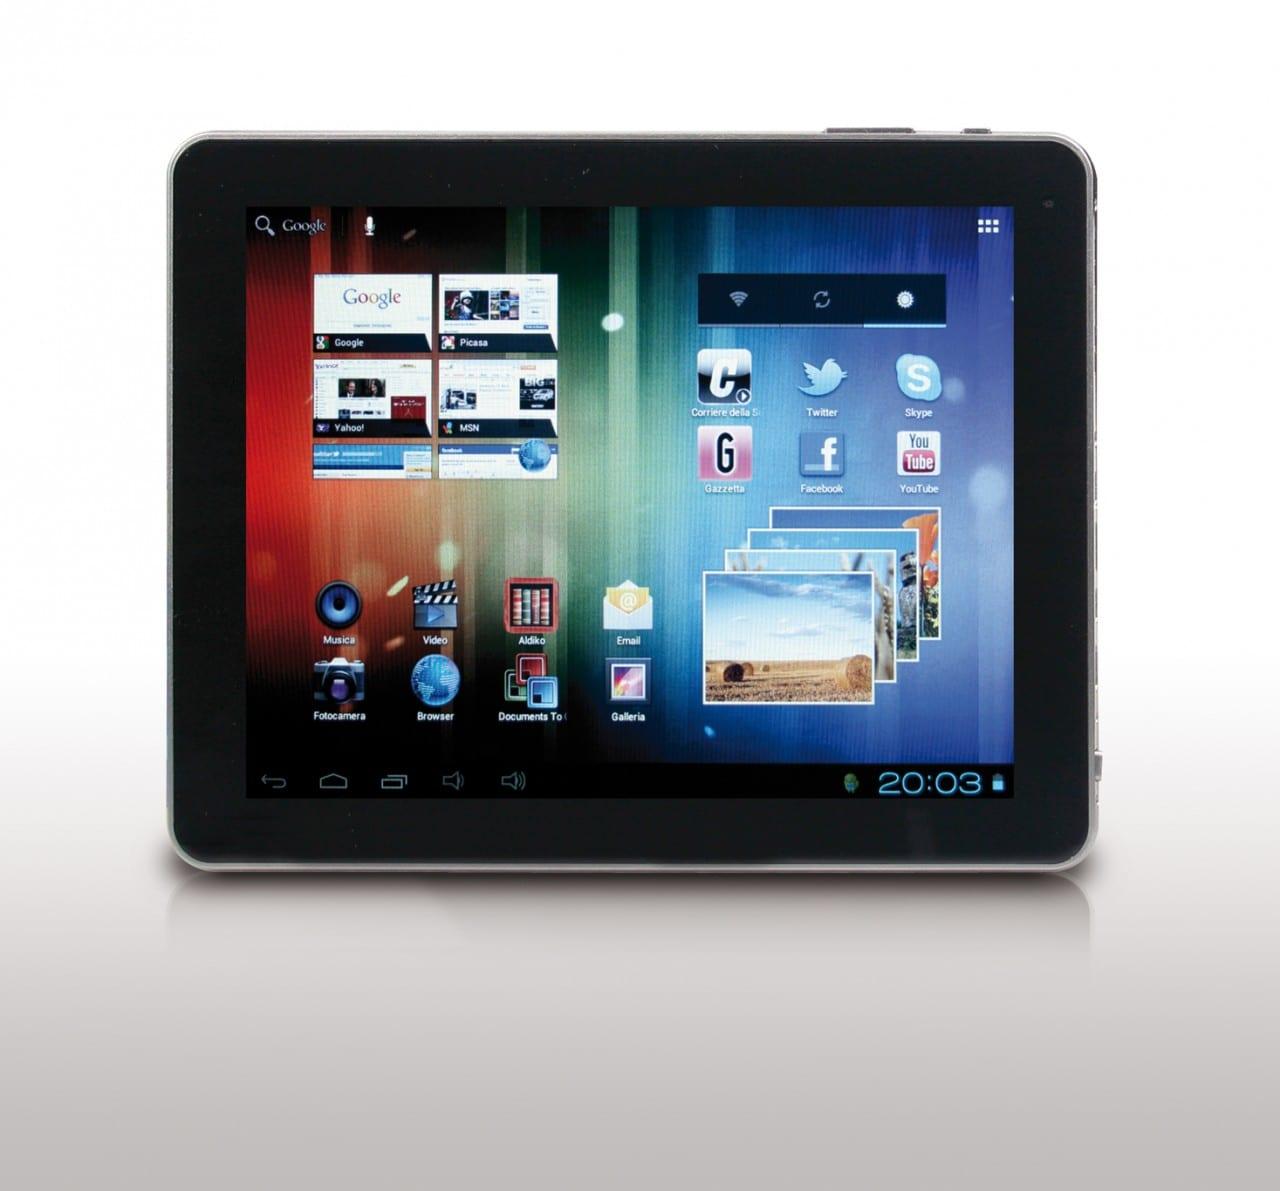 Mediacom SmartPad 930i